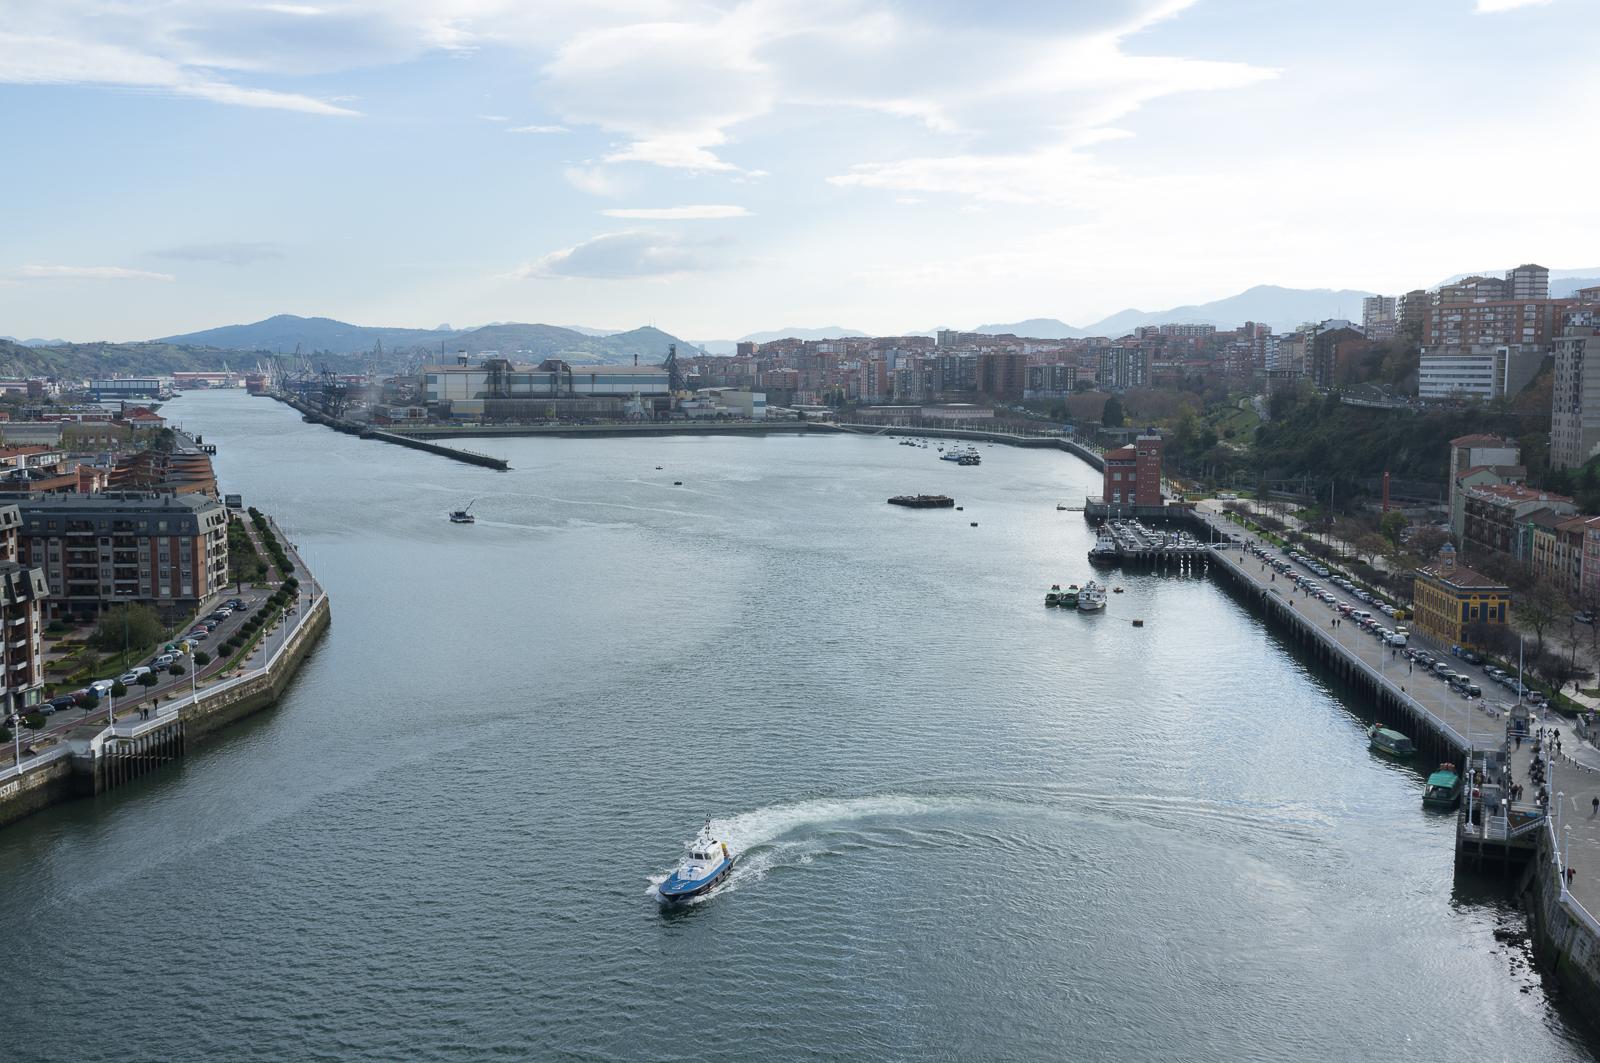 The Vizcaya Transporter Bridge, Biscaya, Bilbao, Spain